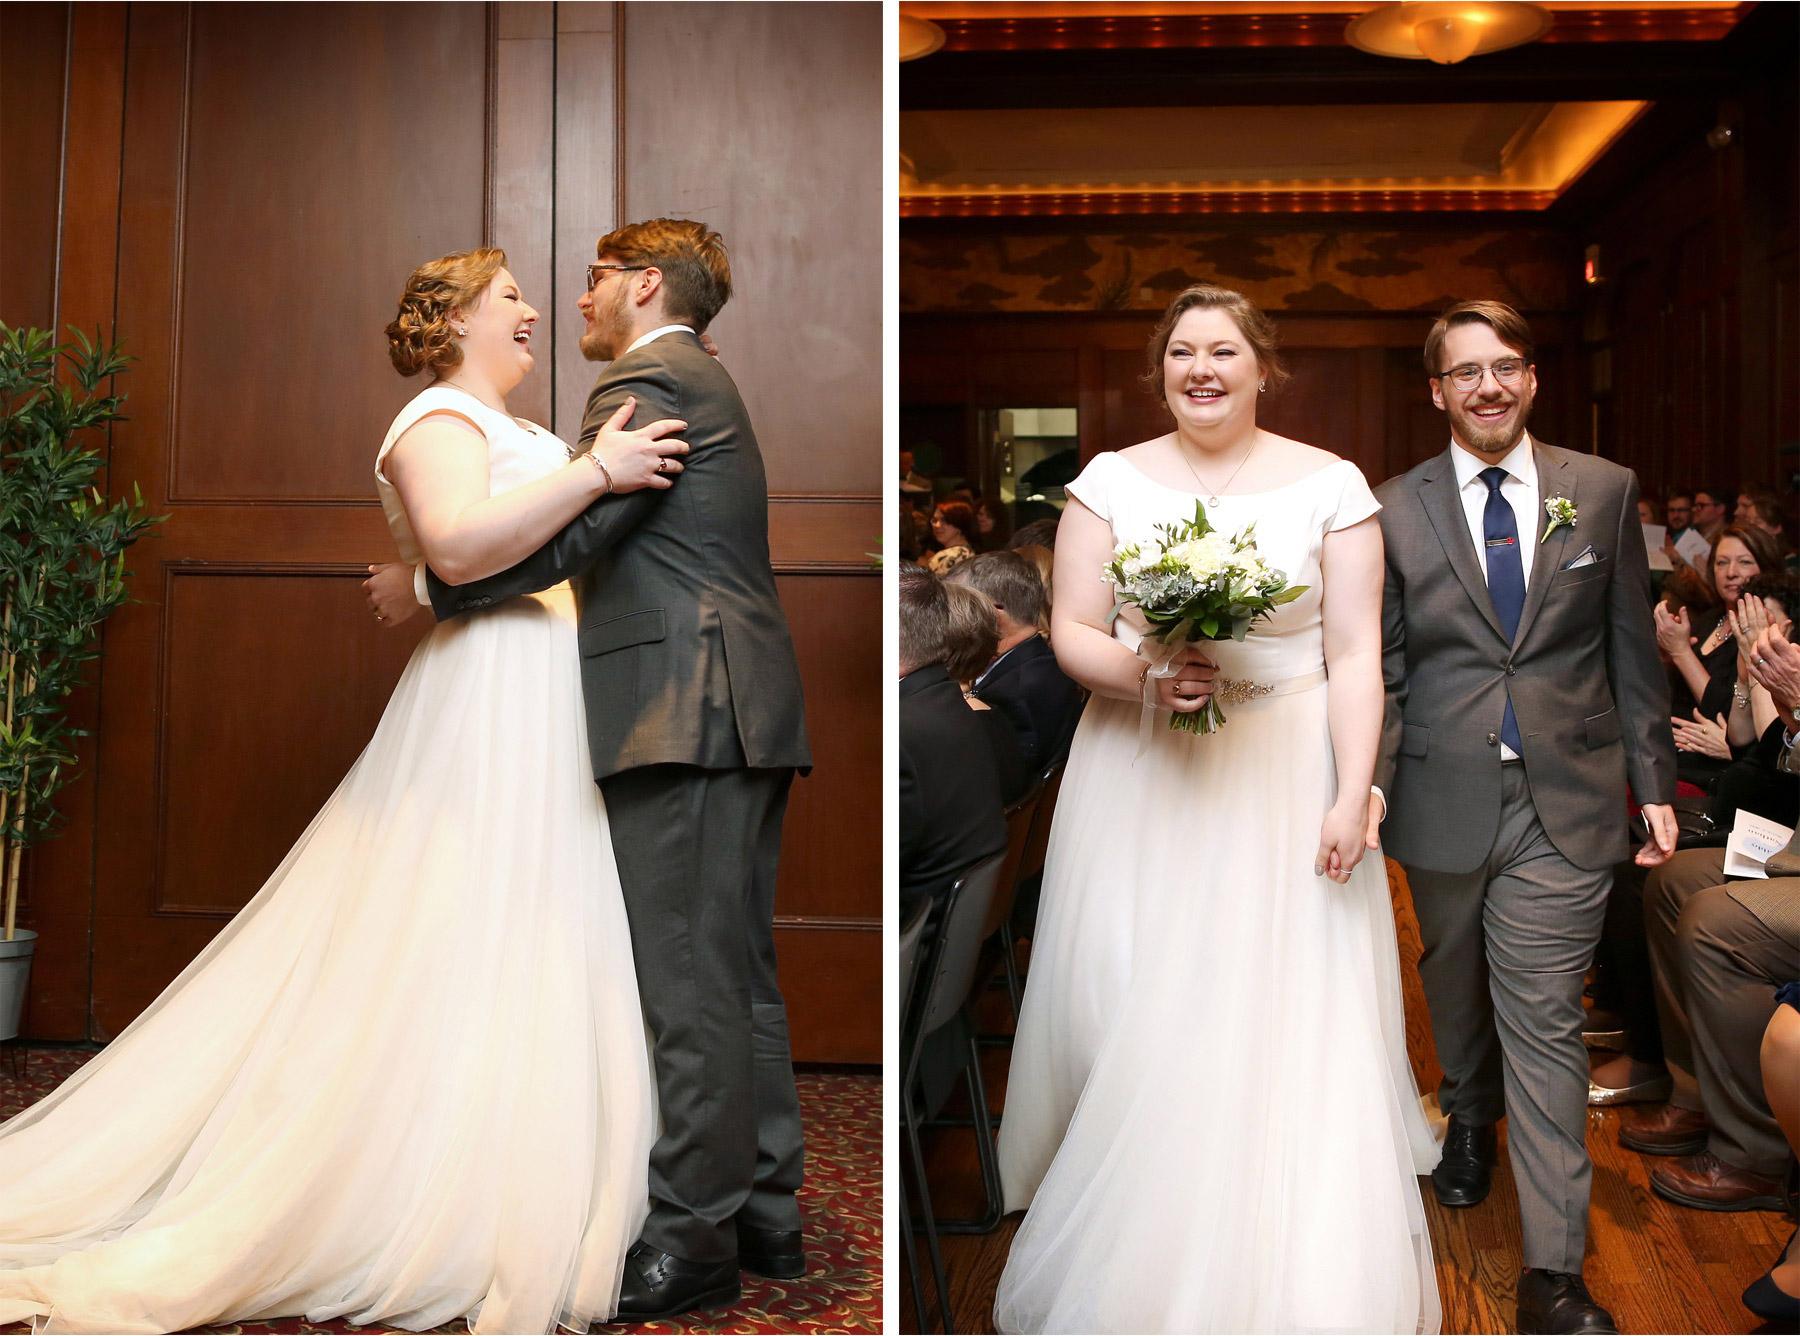 14-Minneapolis-Wedding-Photography-by-Vick-Photography-Ceremony-Metropolitan-Ballroom-Libby-and-Nathan.jpg